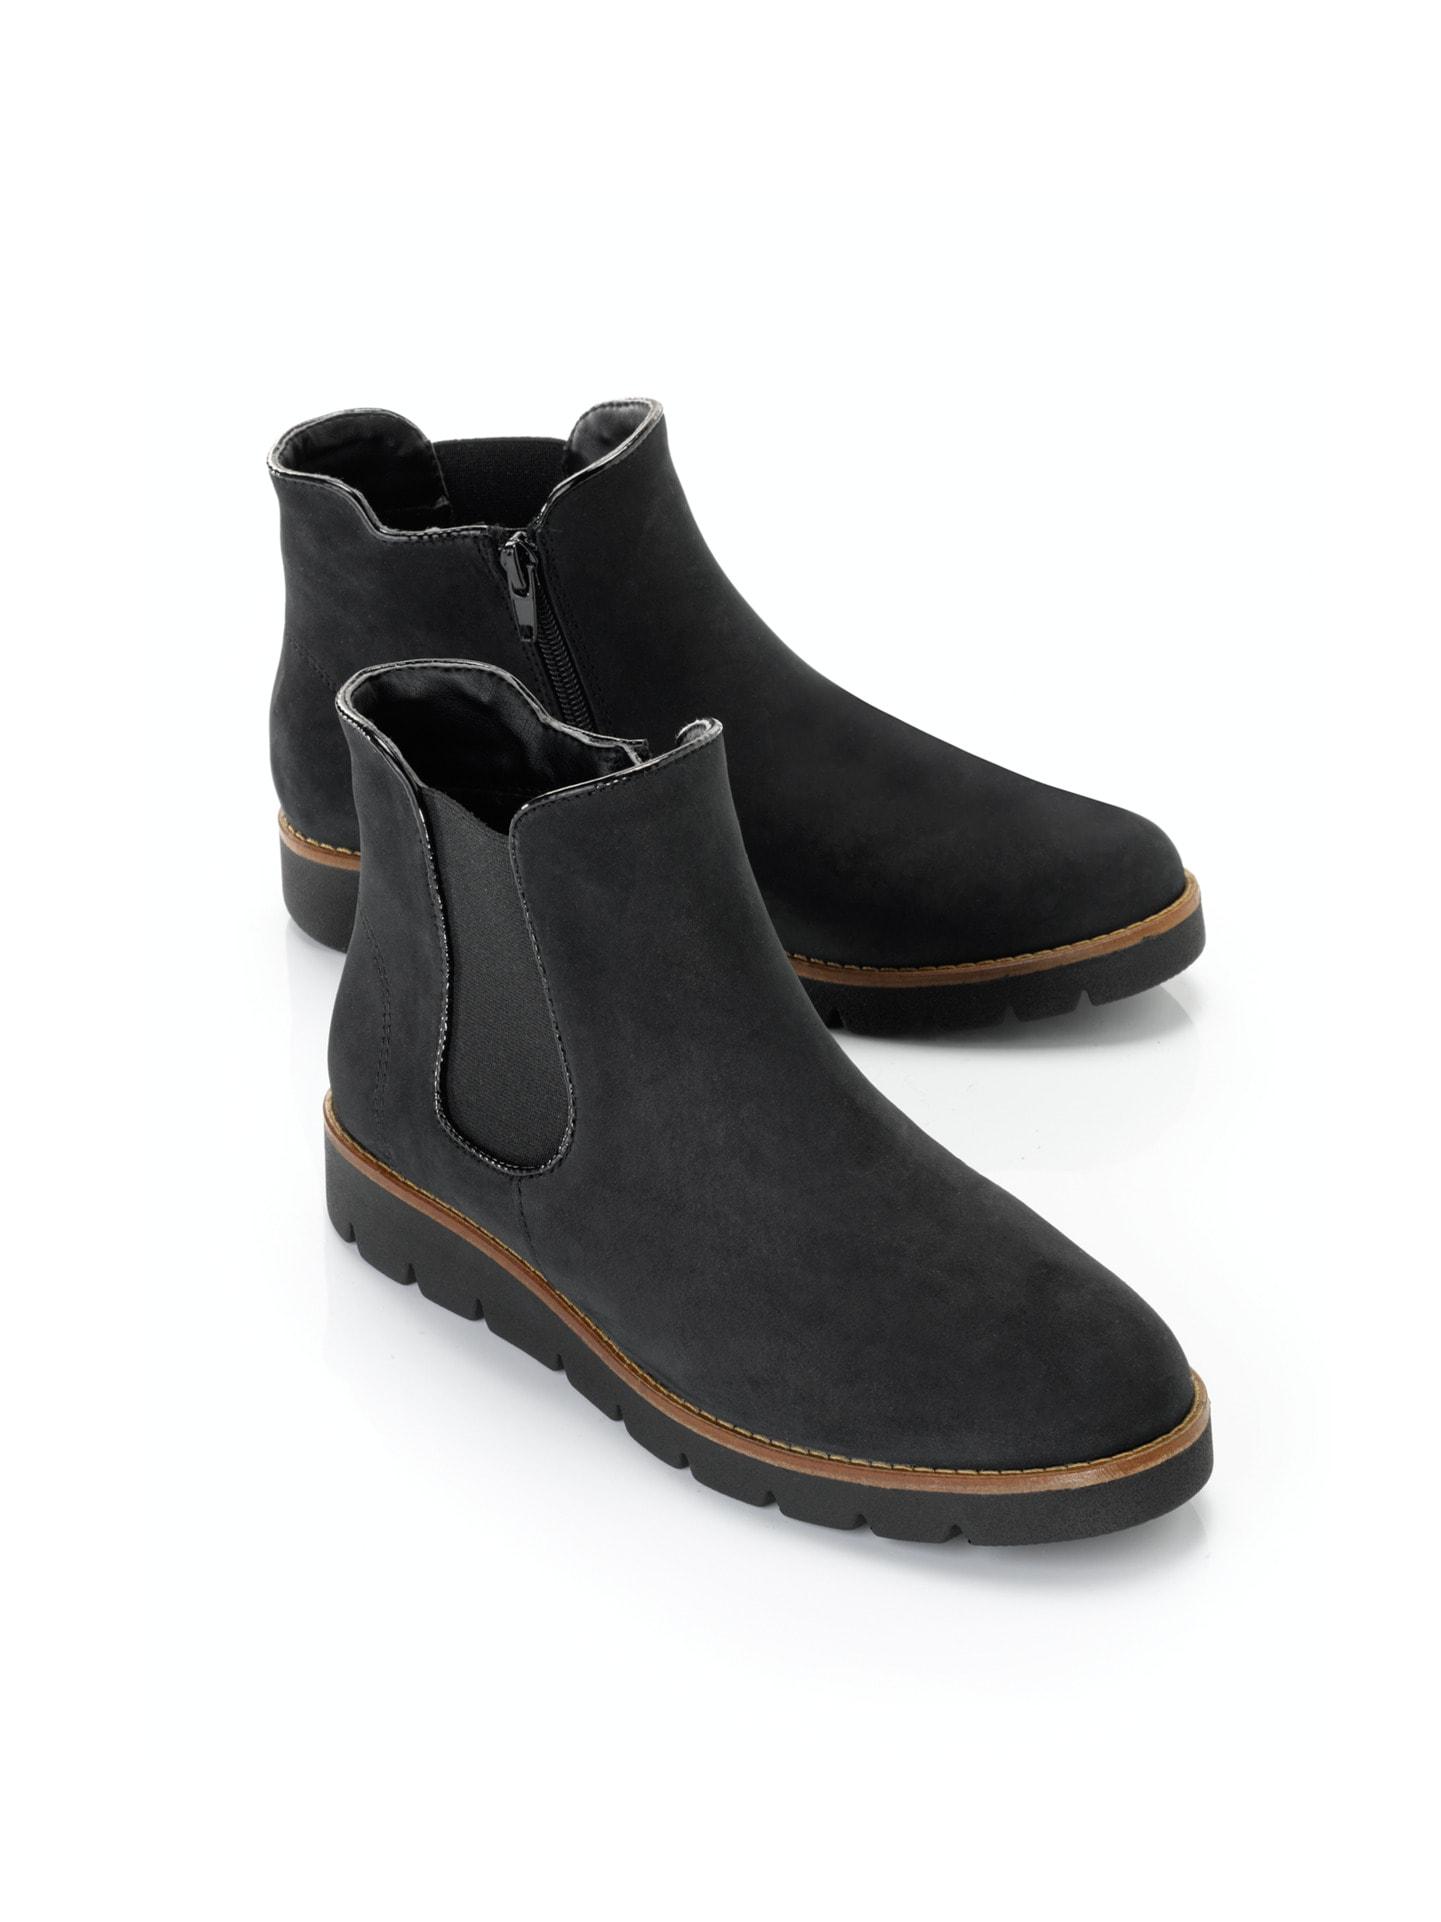 Damen Chelsea-Boots Flexibility Schwarz Gr. 40